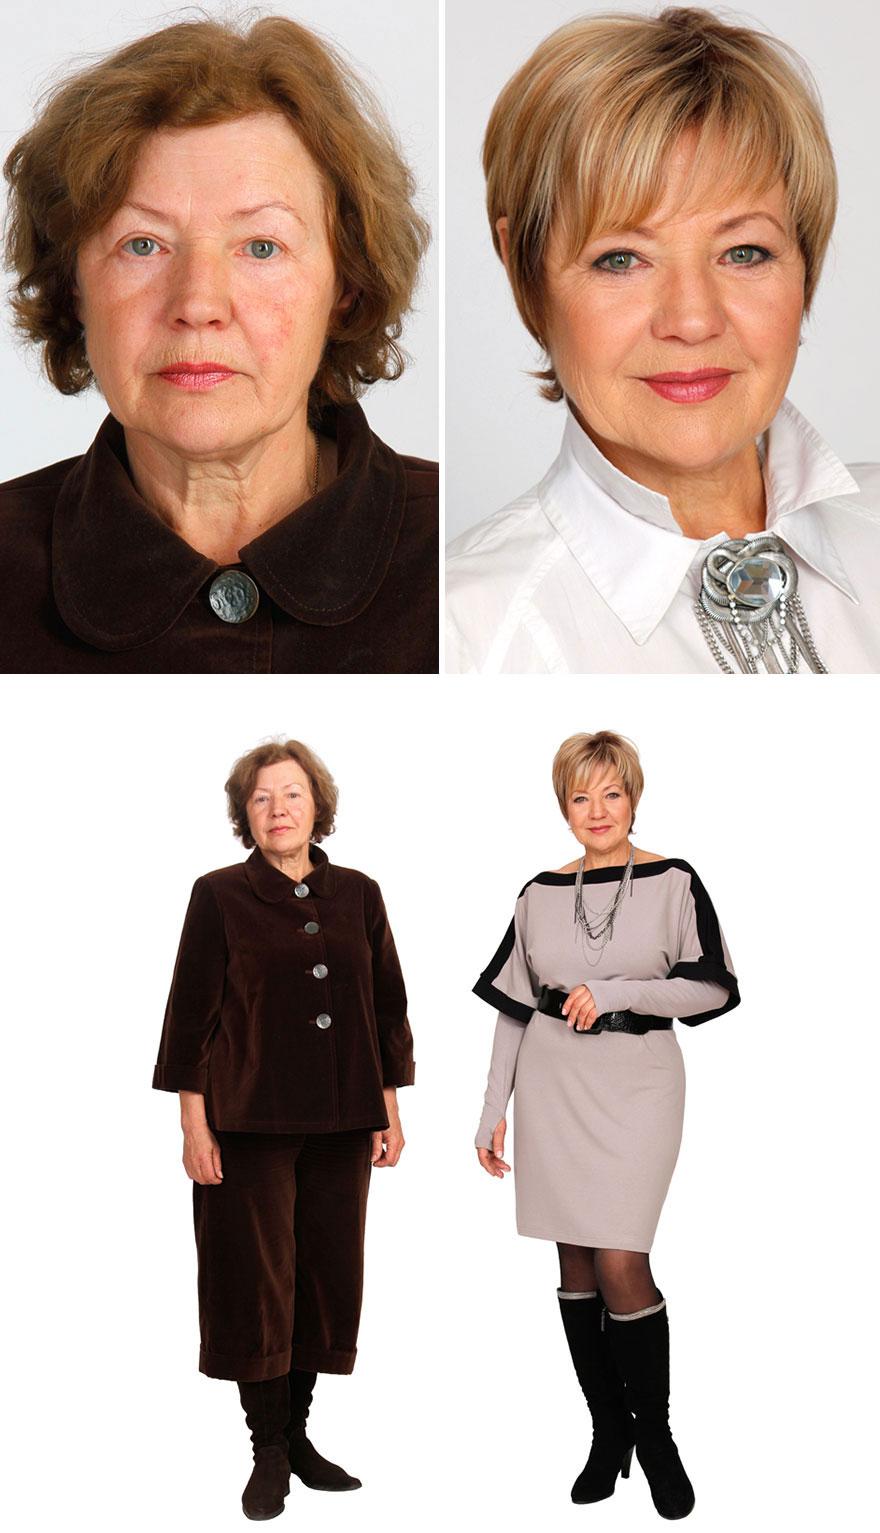 before-after-makeup-woman-style-change-konstantin-bogomolov-3